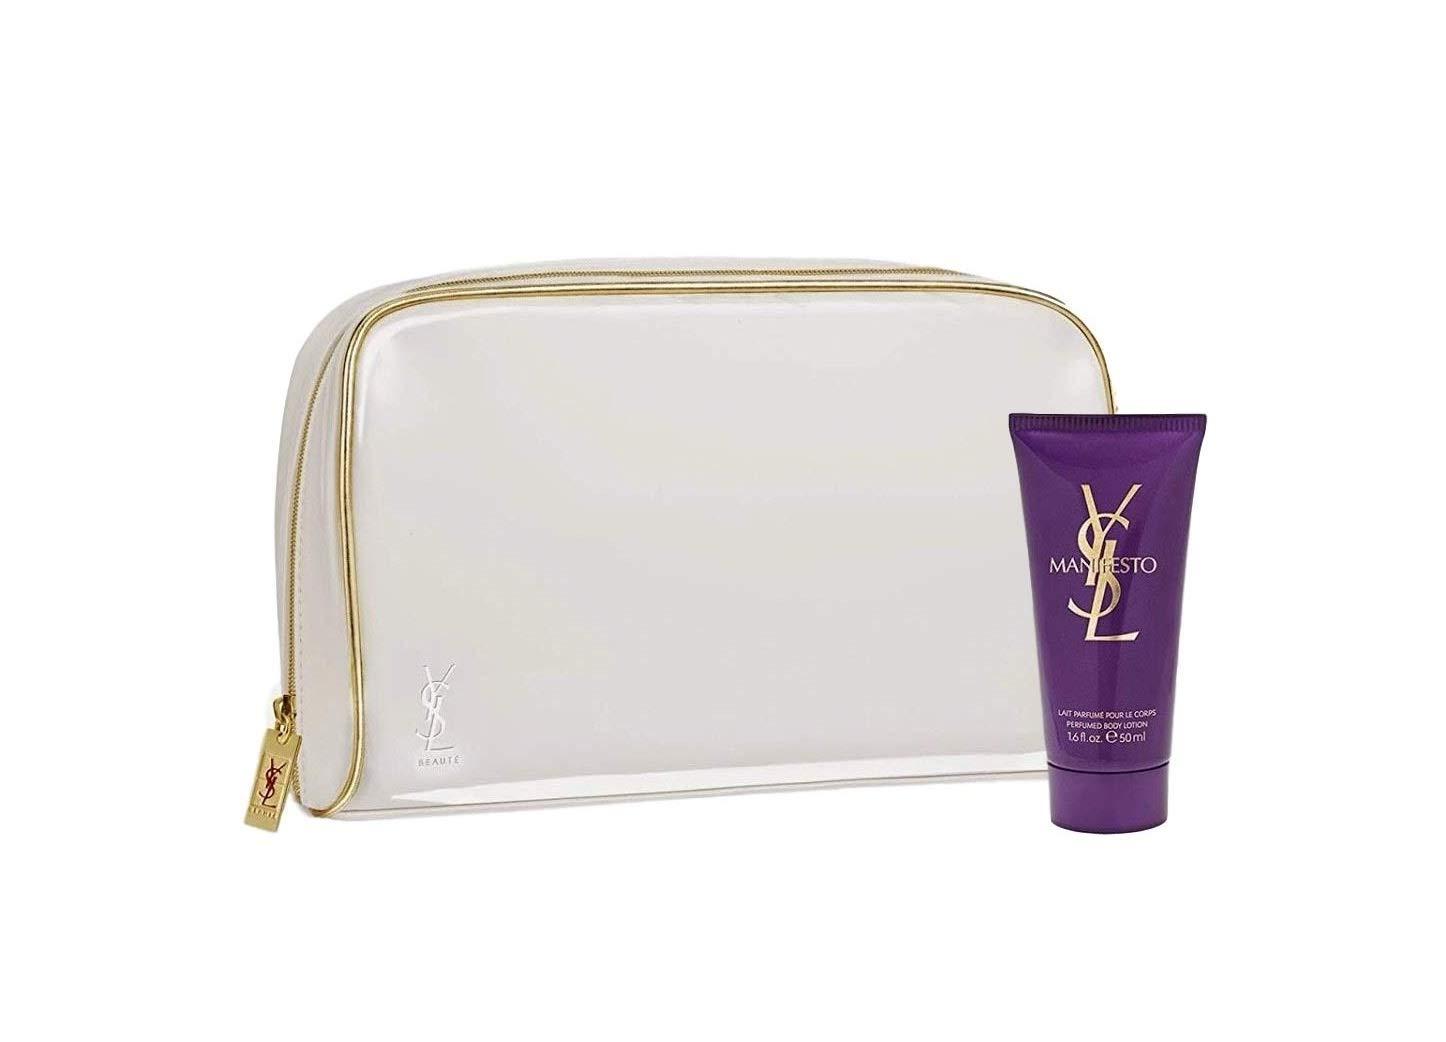 9bc9672dec81 Amazon.com   Yves Saint Laurent Manifesto Women s Cosmetic Makeup Bag Pouch  + Free Perfumed Body Lotion   Beauty